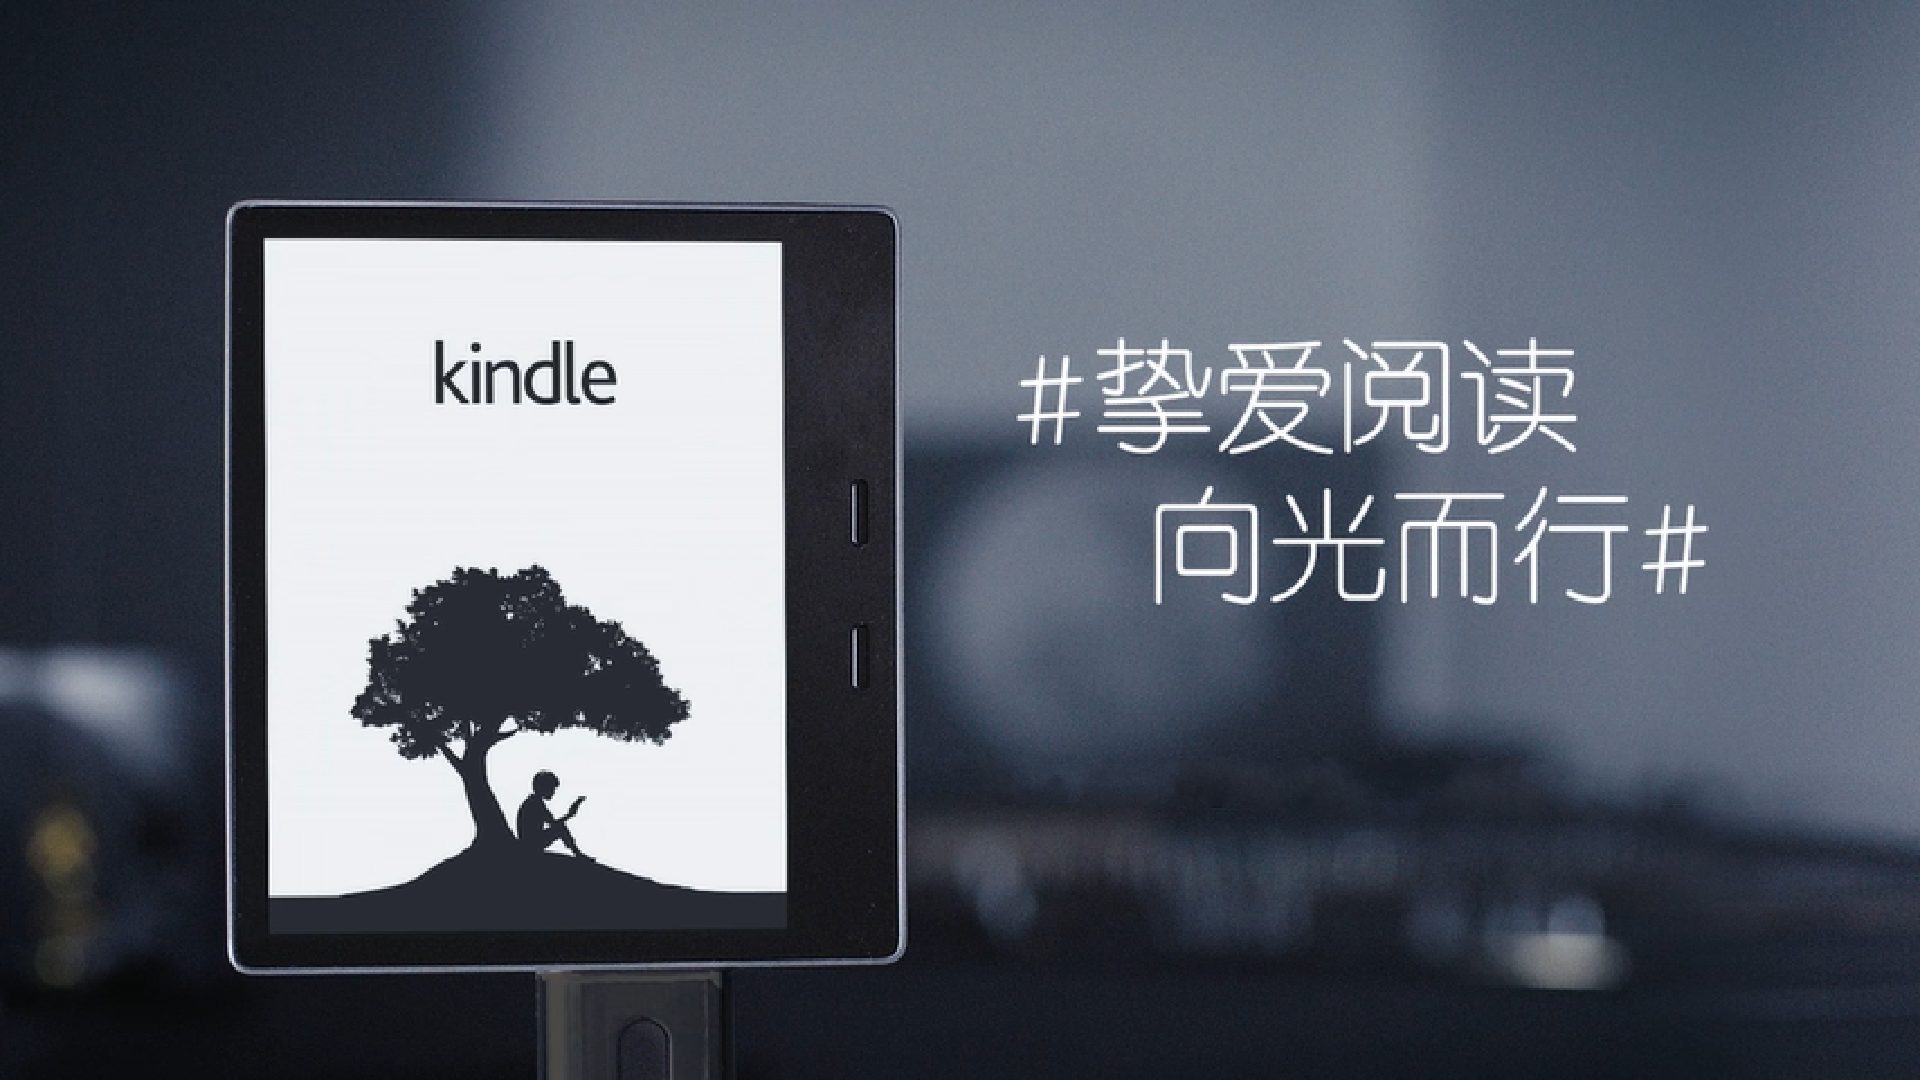 Kindle:「挚爱阅读,向光而行」世界读书日系列活动